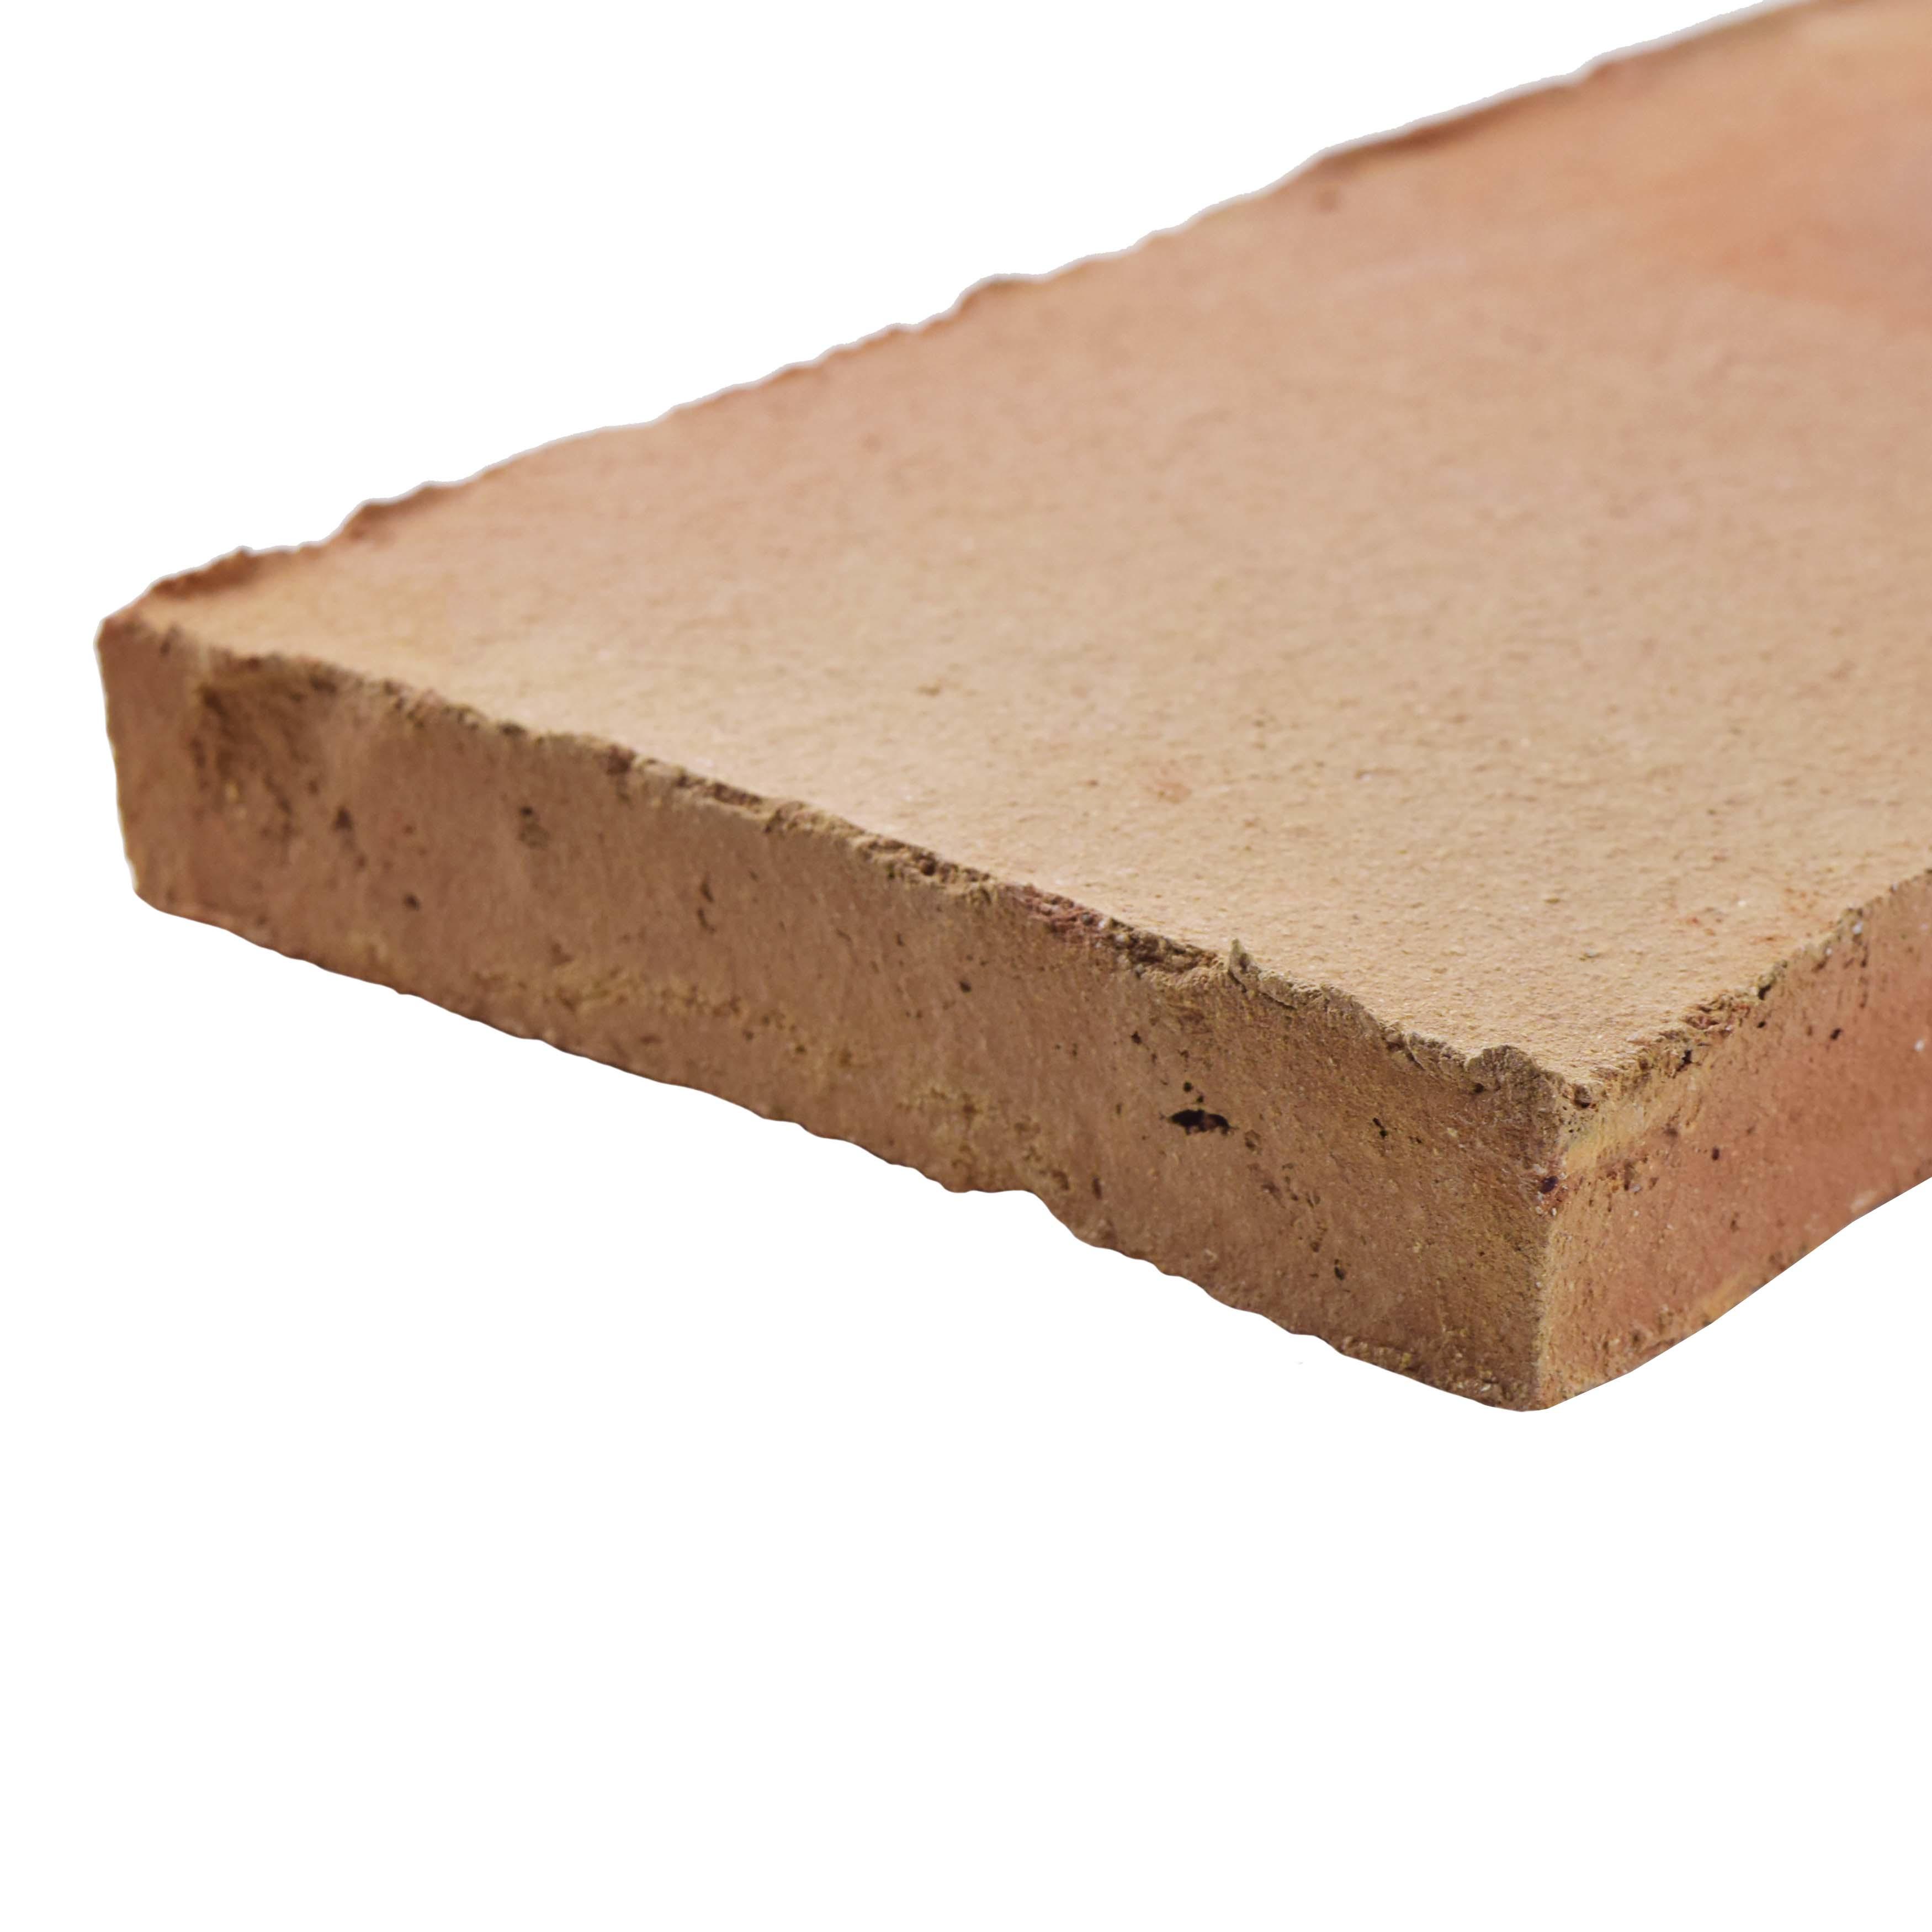 1 Flooring Tiles in Pakistan Rectangular Shape Terracotta Floor Tiles Design Images.